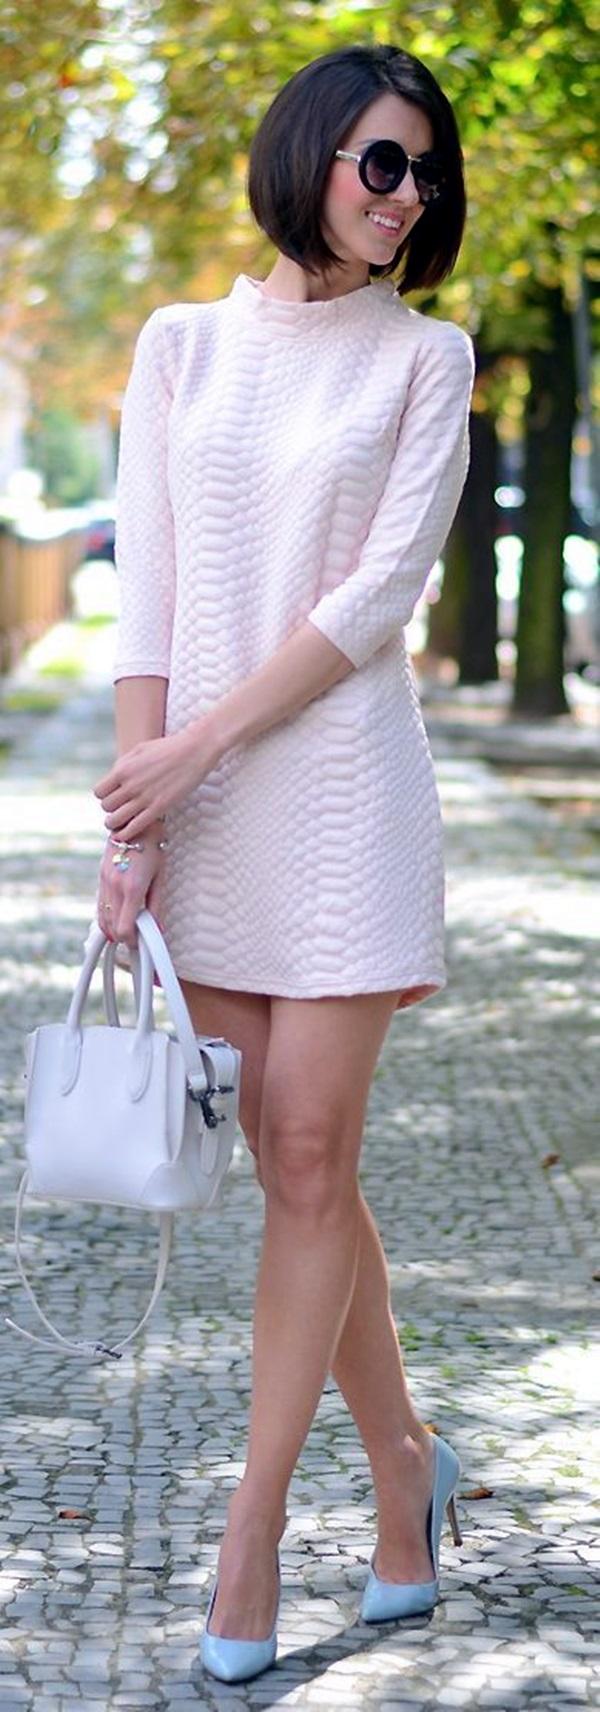 Retro Fashion Style Outfits (3)